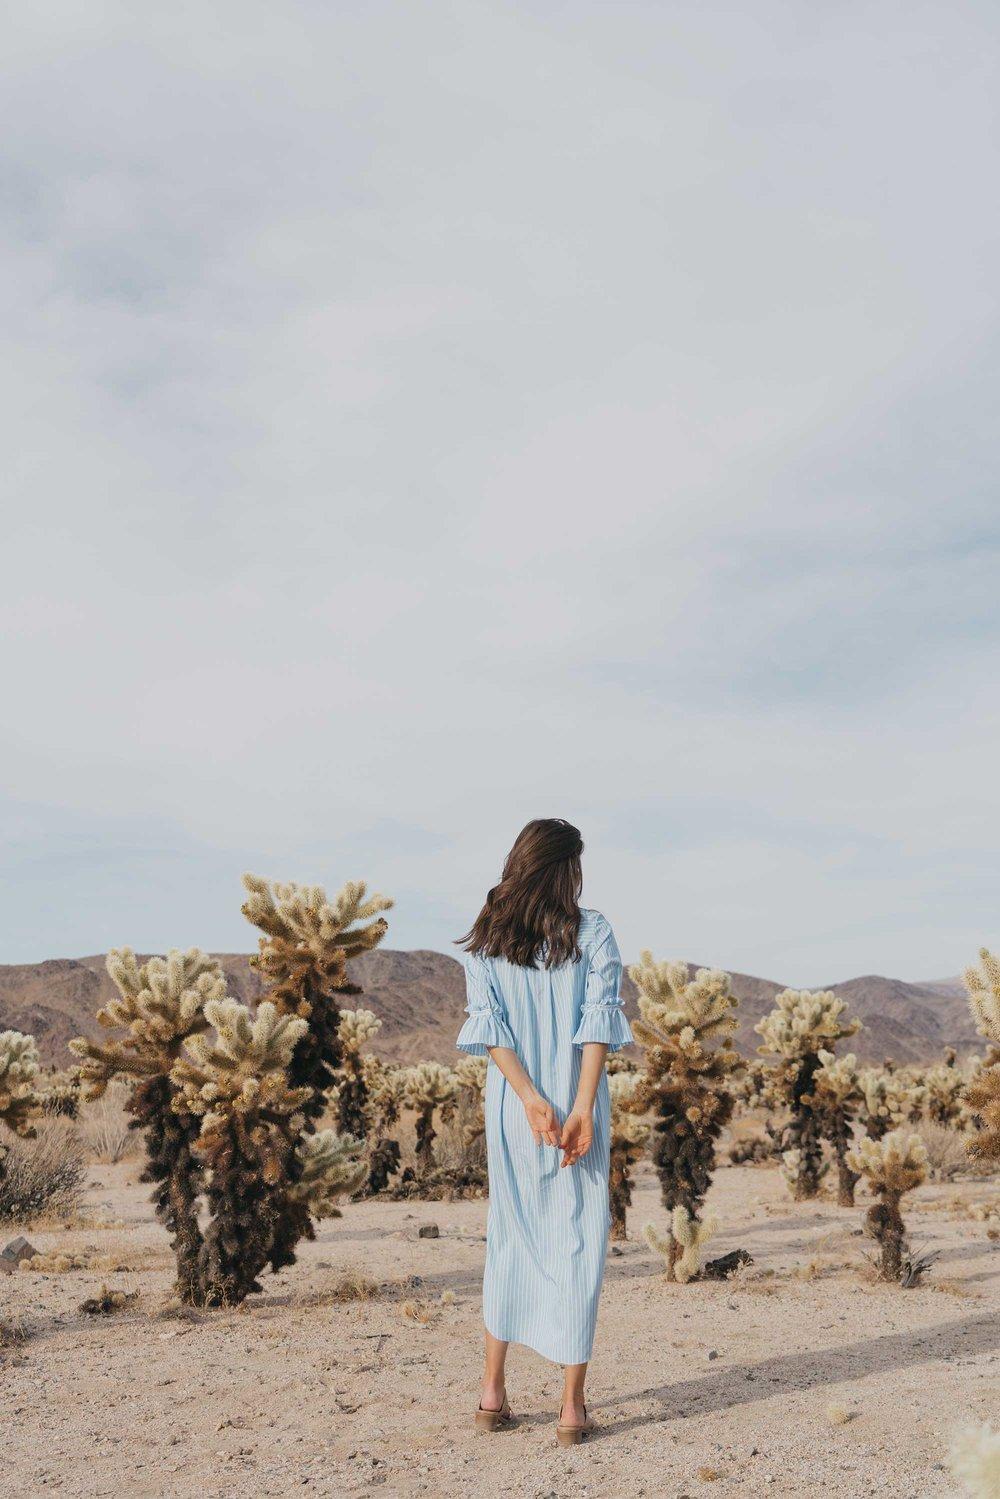 Frill Sleeve Maxi Shirt Dress Festival Outfit Coachella Joshua Tree Cholla Cactus Garden9.jpg